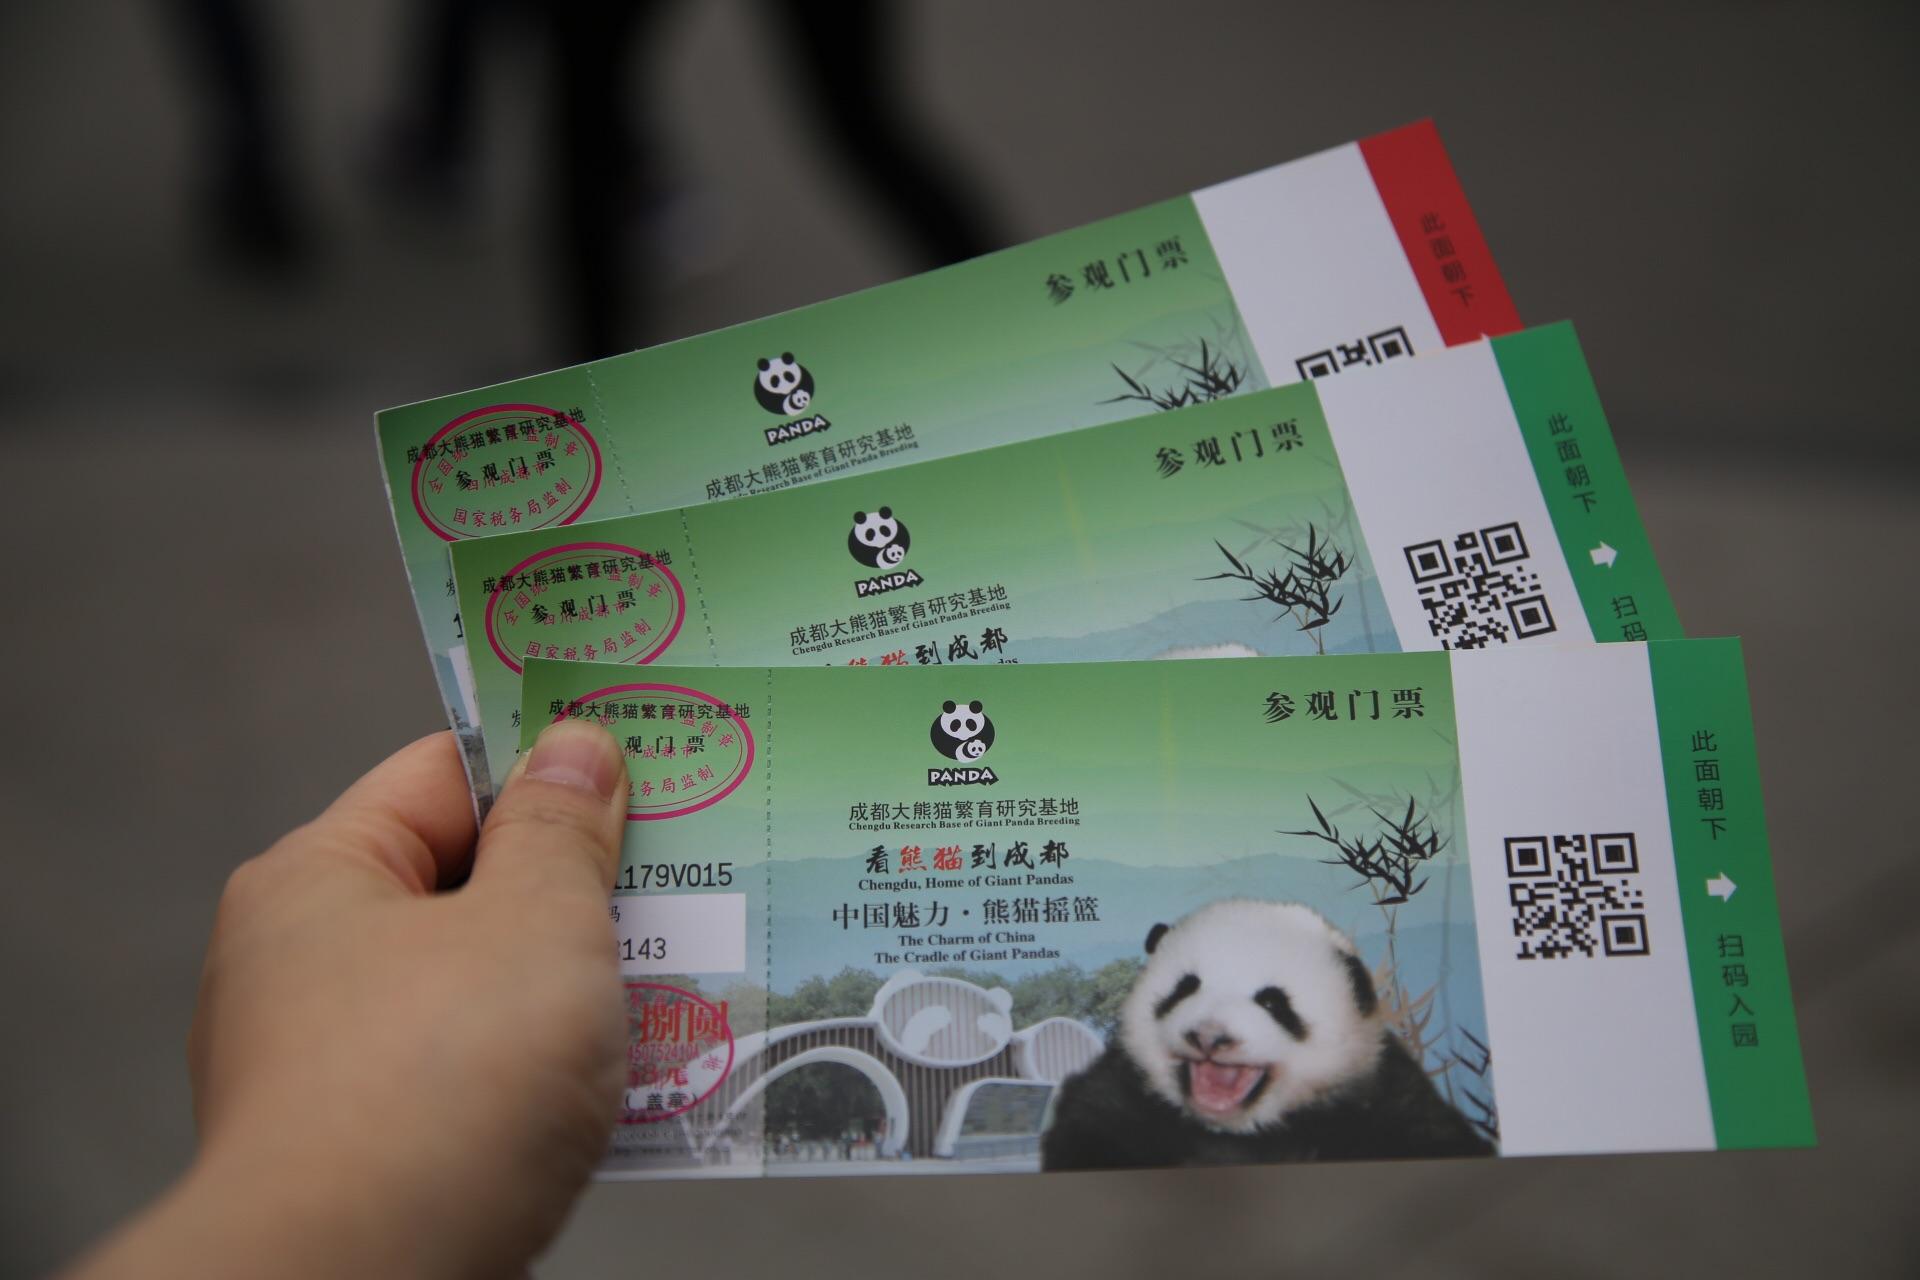 China Chengdu Research Base of Giant Panda Breeding